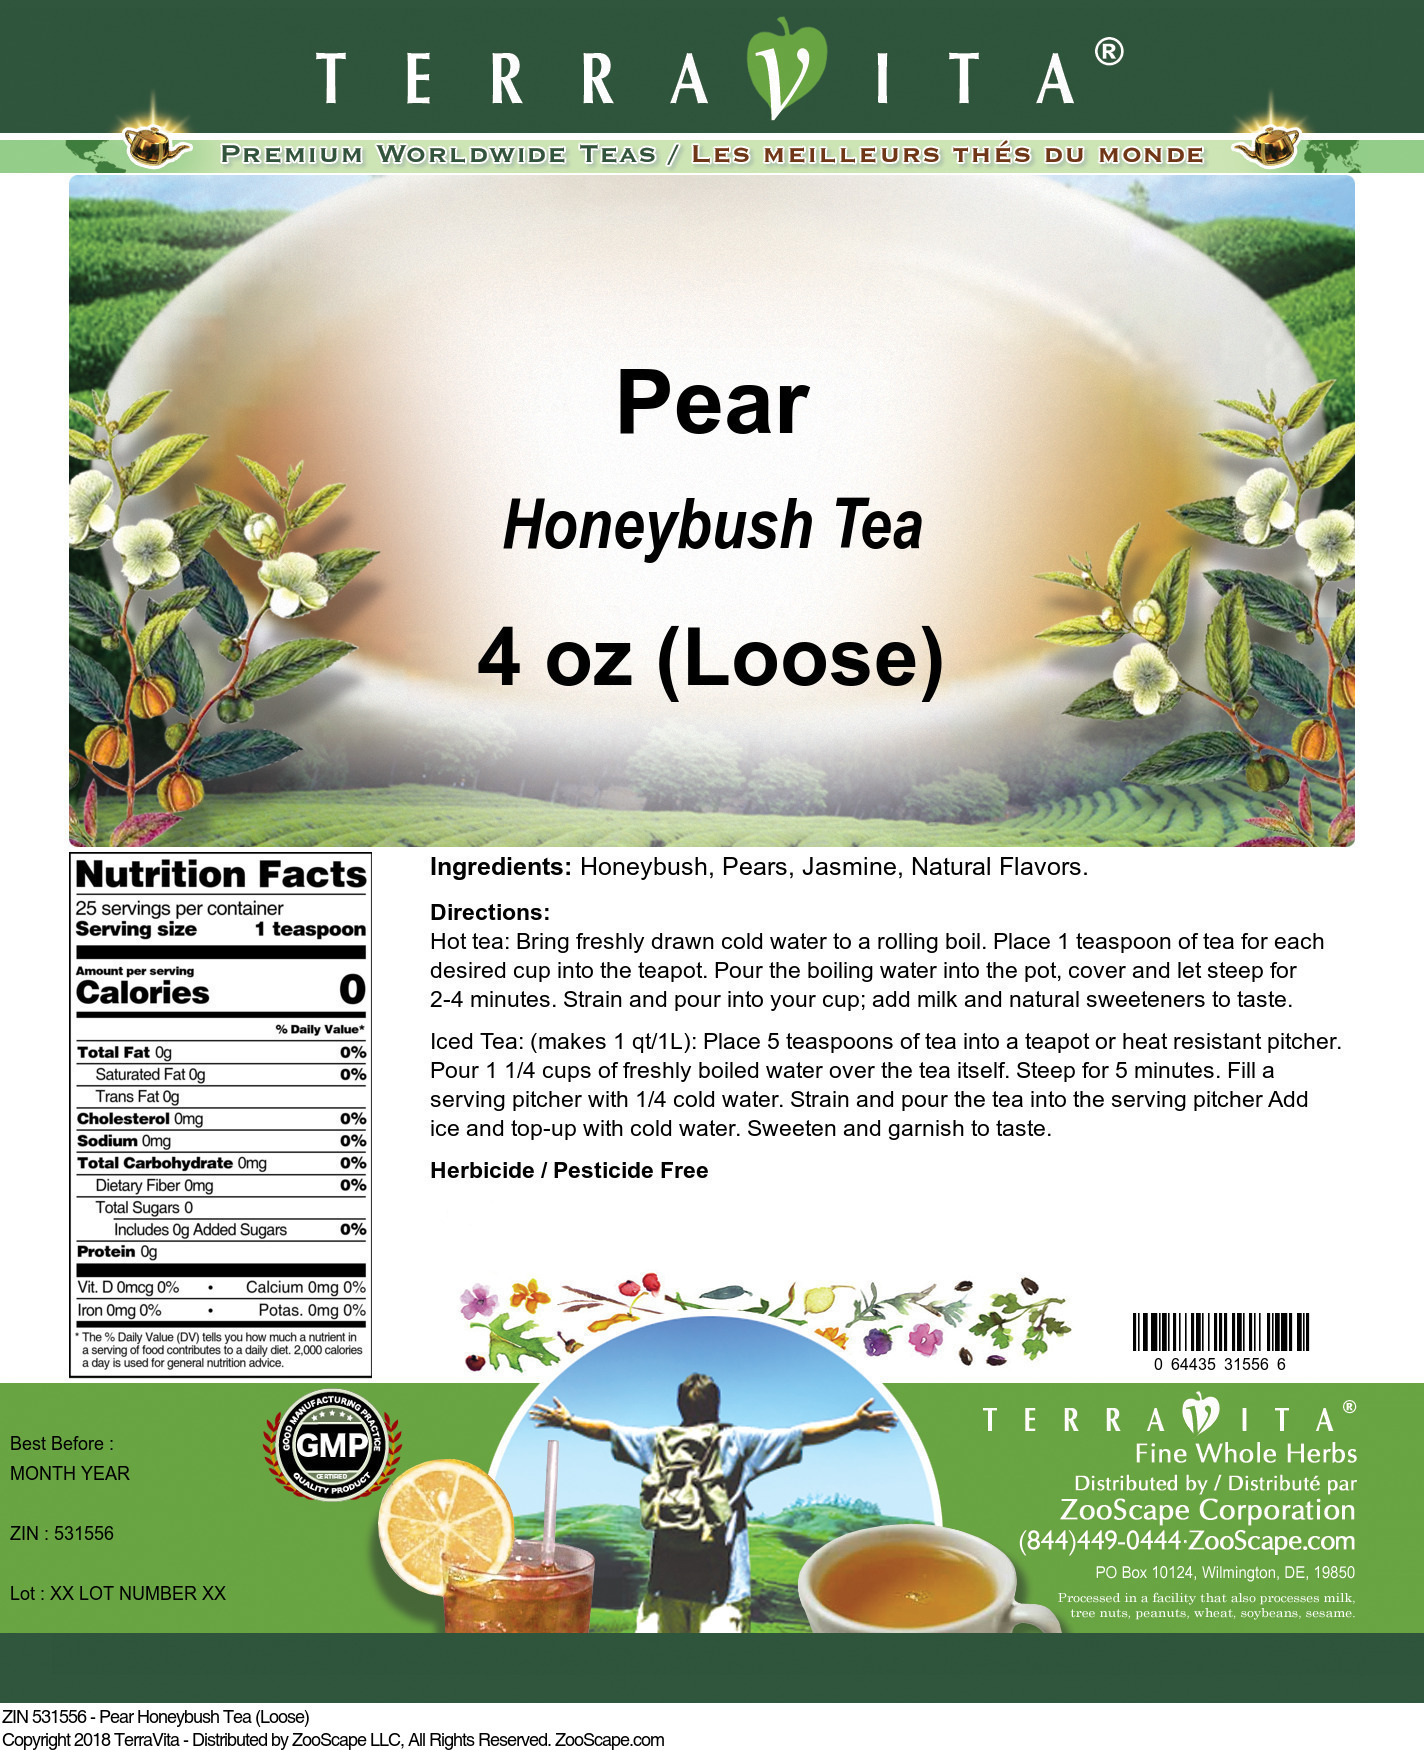 Pear Honeybush Tea (Loose)